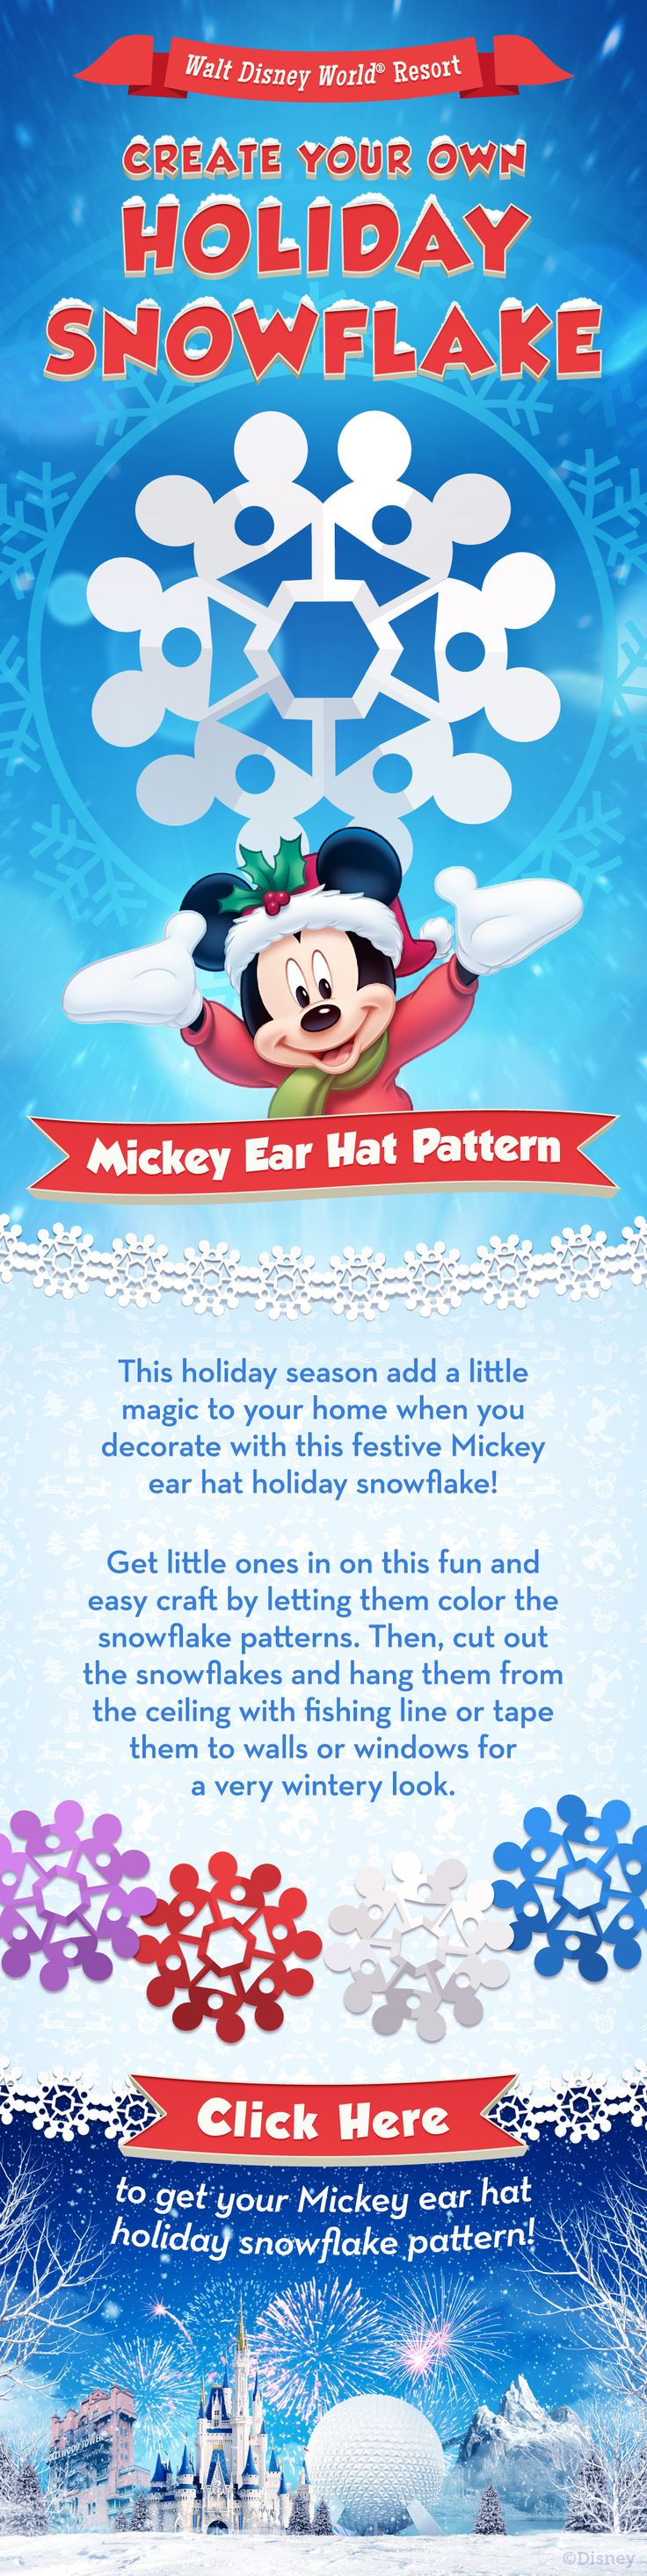 Create a fun Mickey Ear Hat pattern snowflake! #crafts #disney #kids